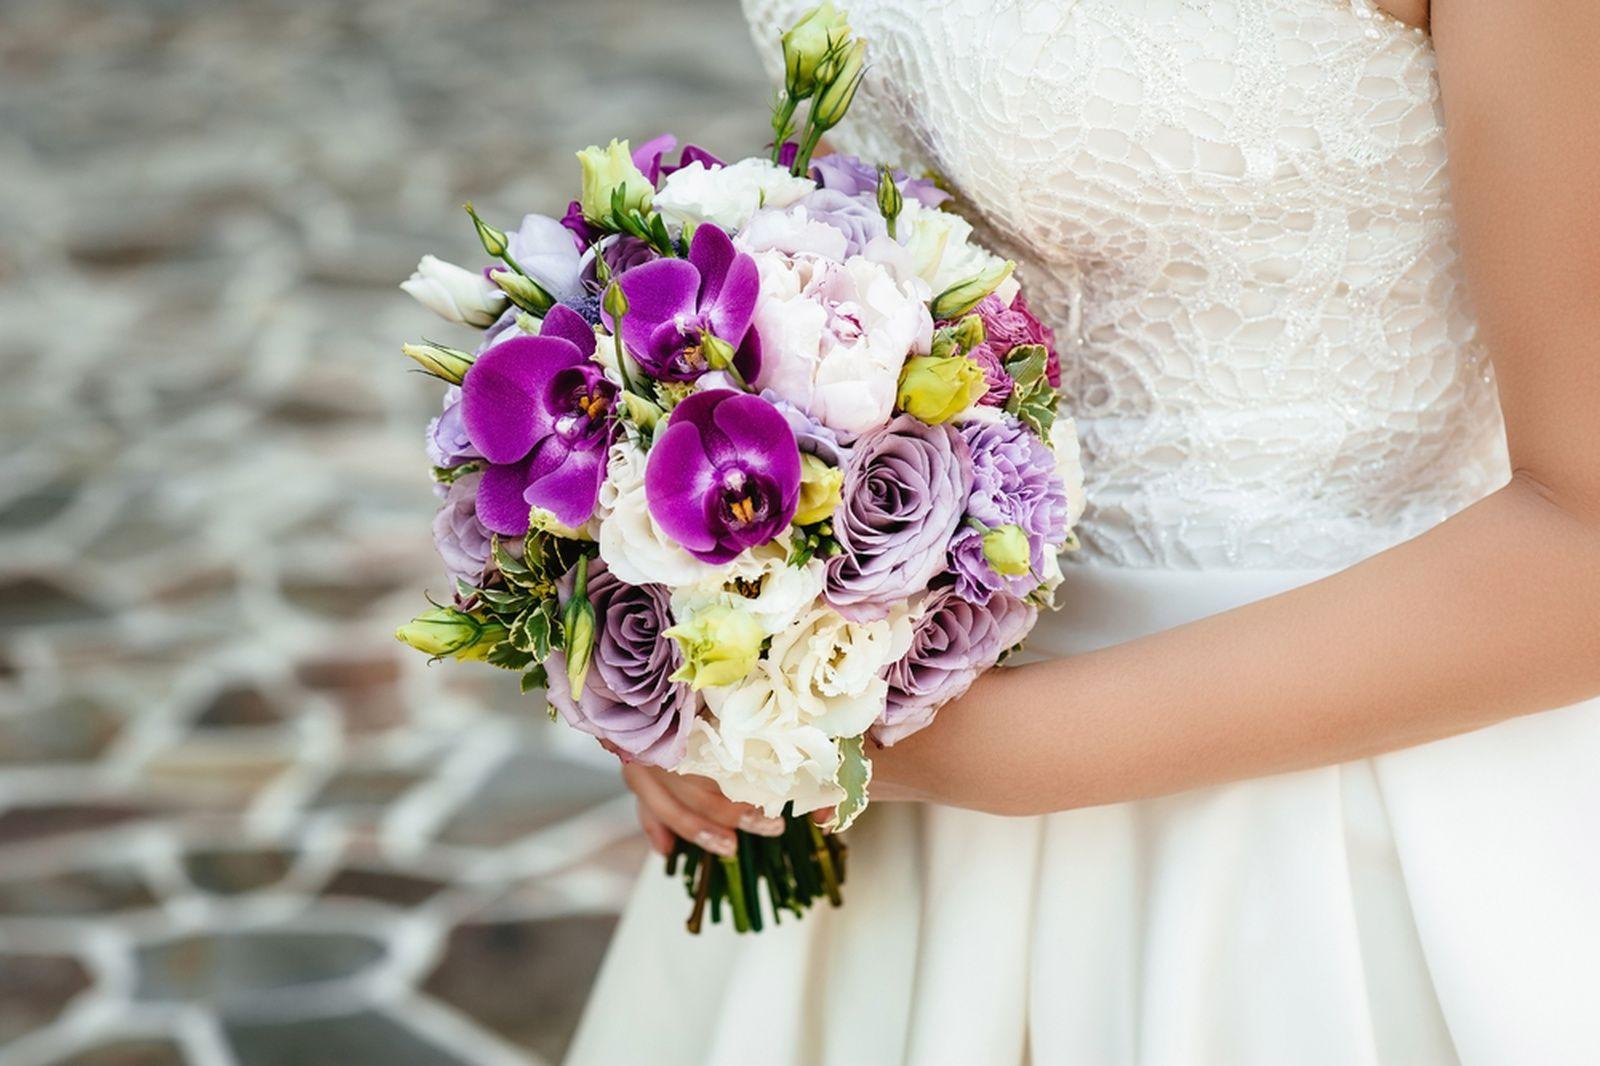 Buquê noiva de orquídeas